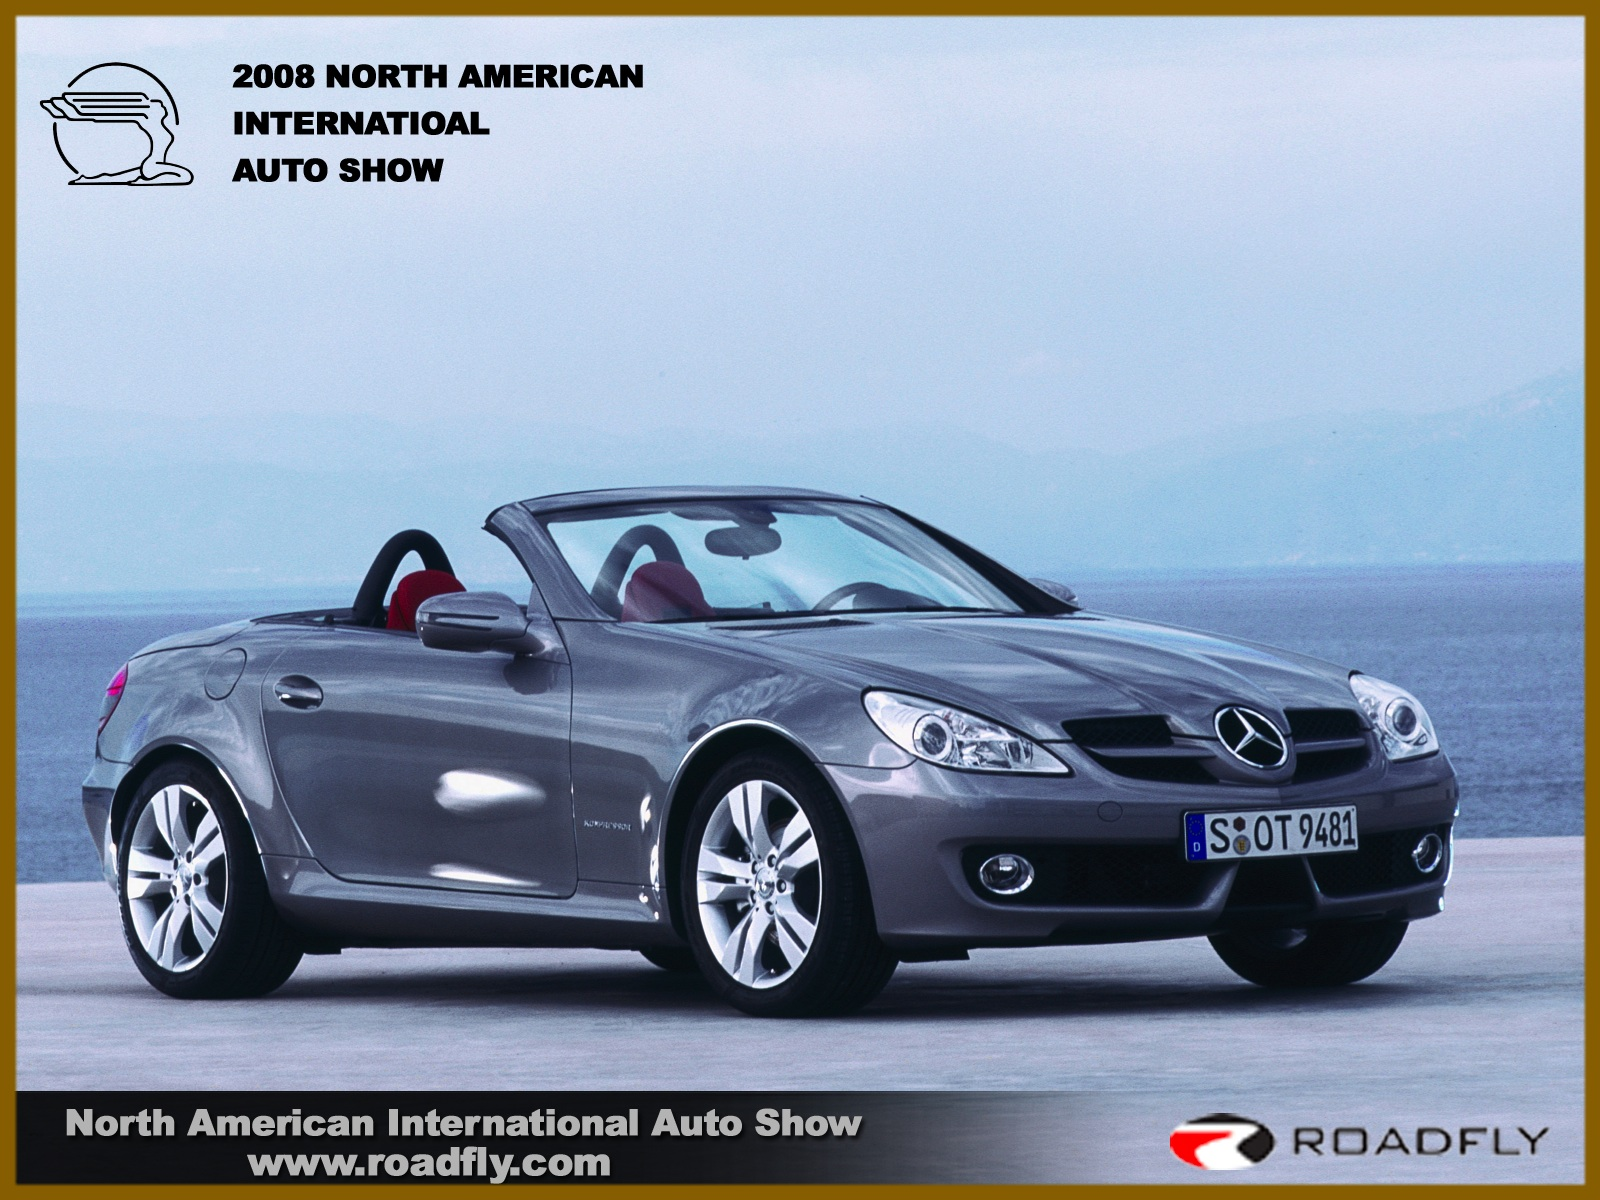 Mercedes benz slk 200 photos reviews news specs buy car for Buy a mercedes benz